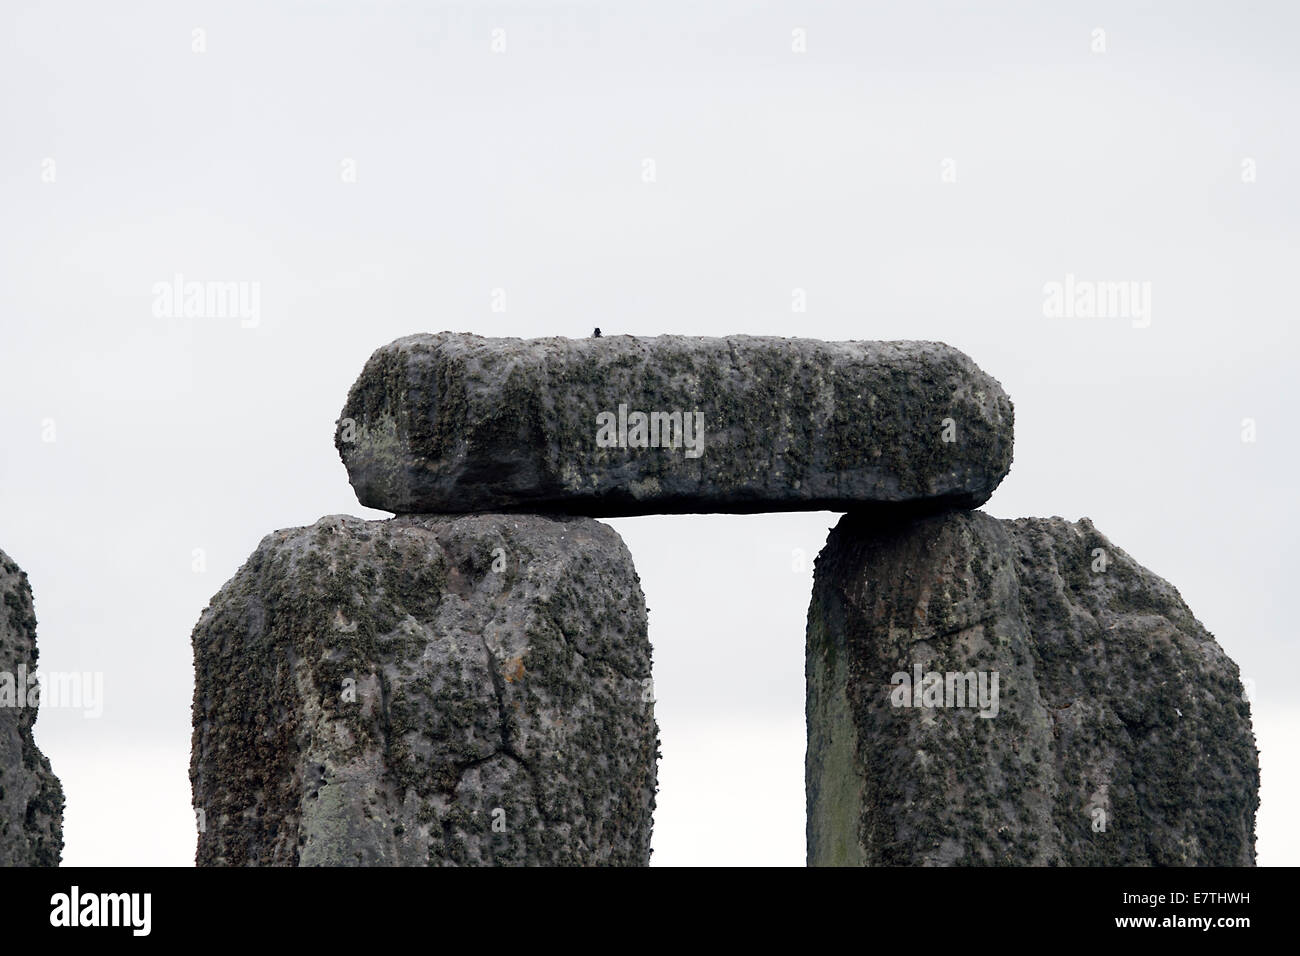 Stonehenge - Lintel on inner circle standing stones - Stock Image